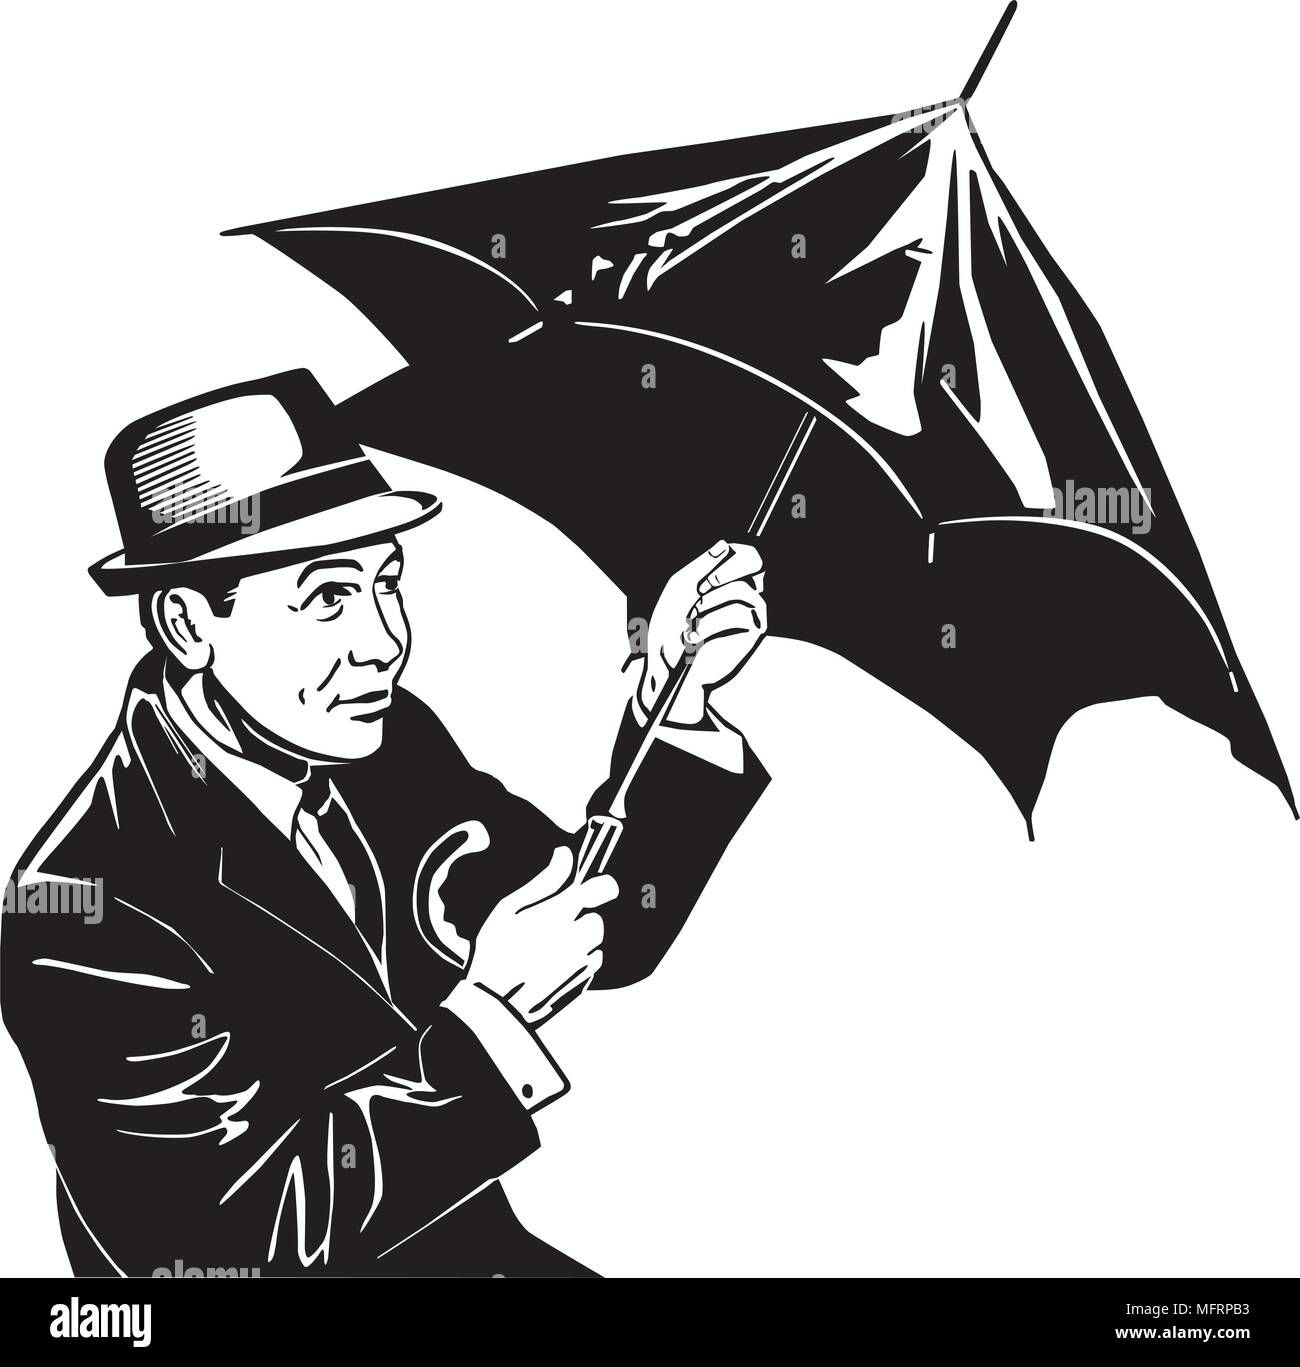 Man With Umbrella - Retro Clipart Illustration - Stock Image